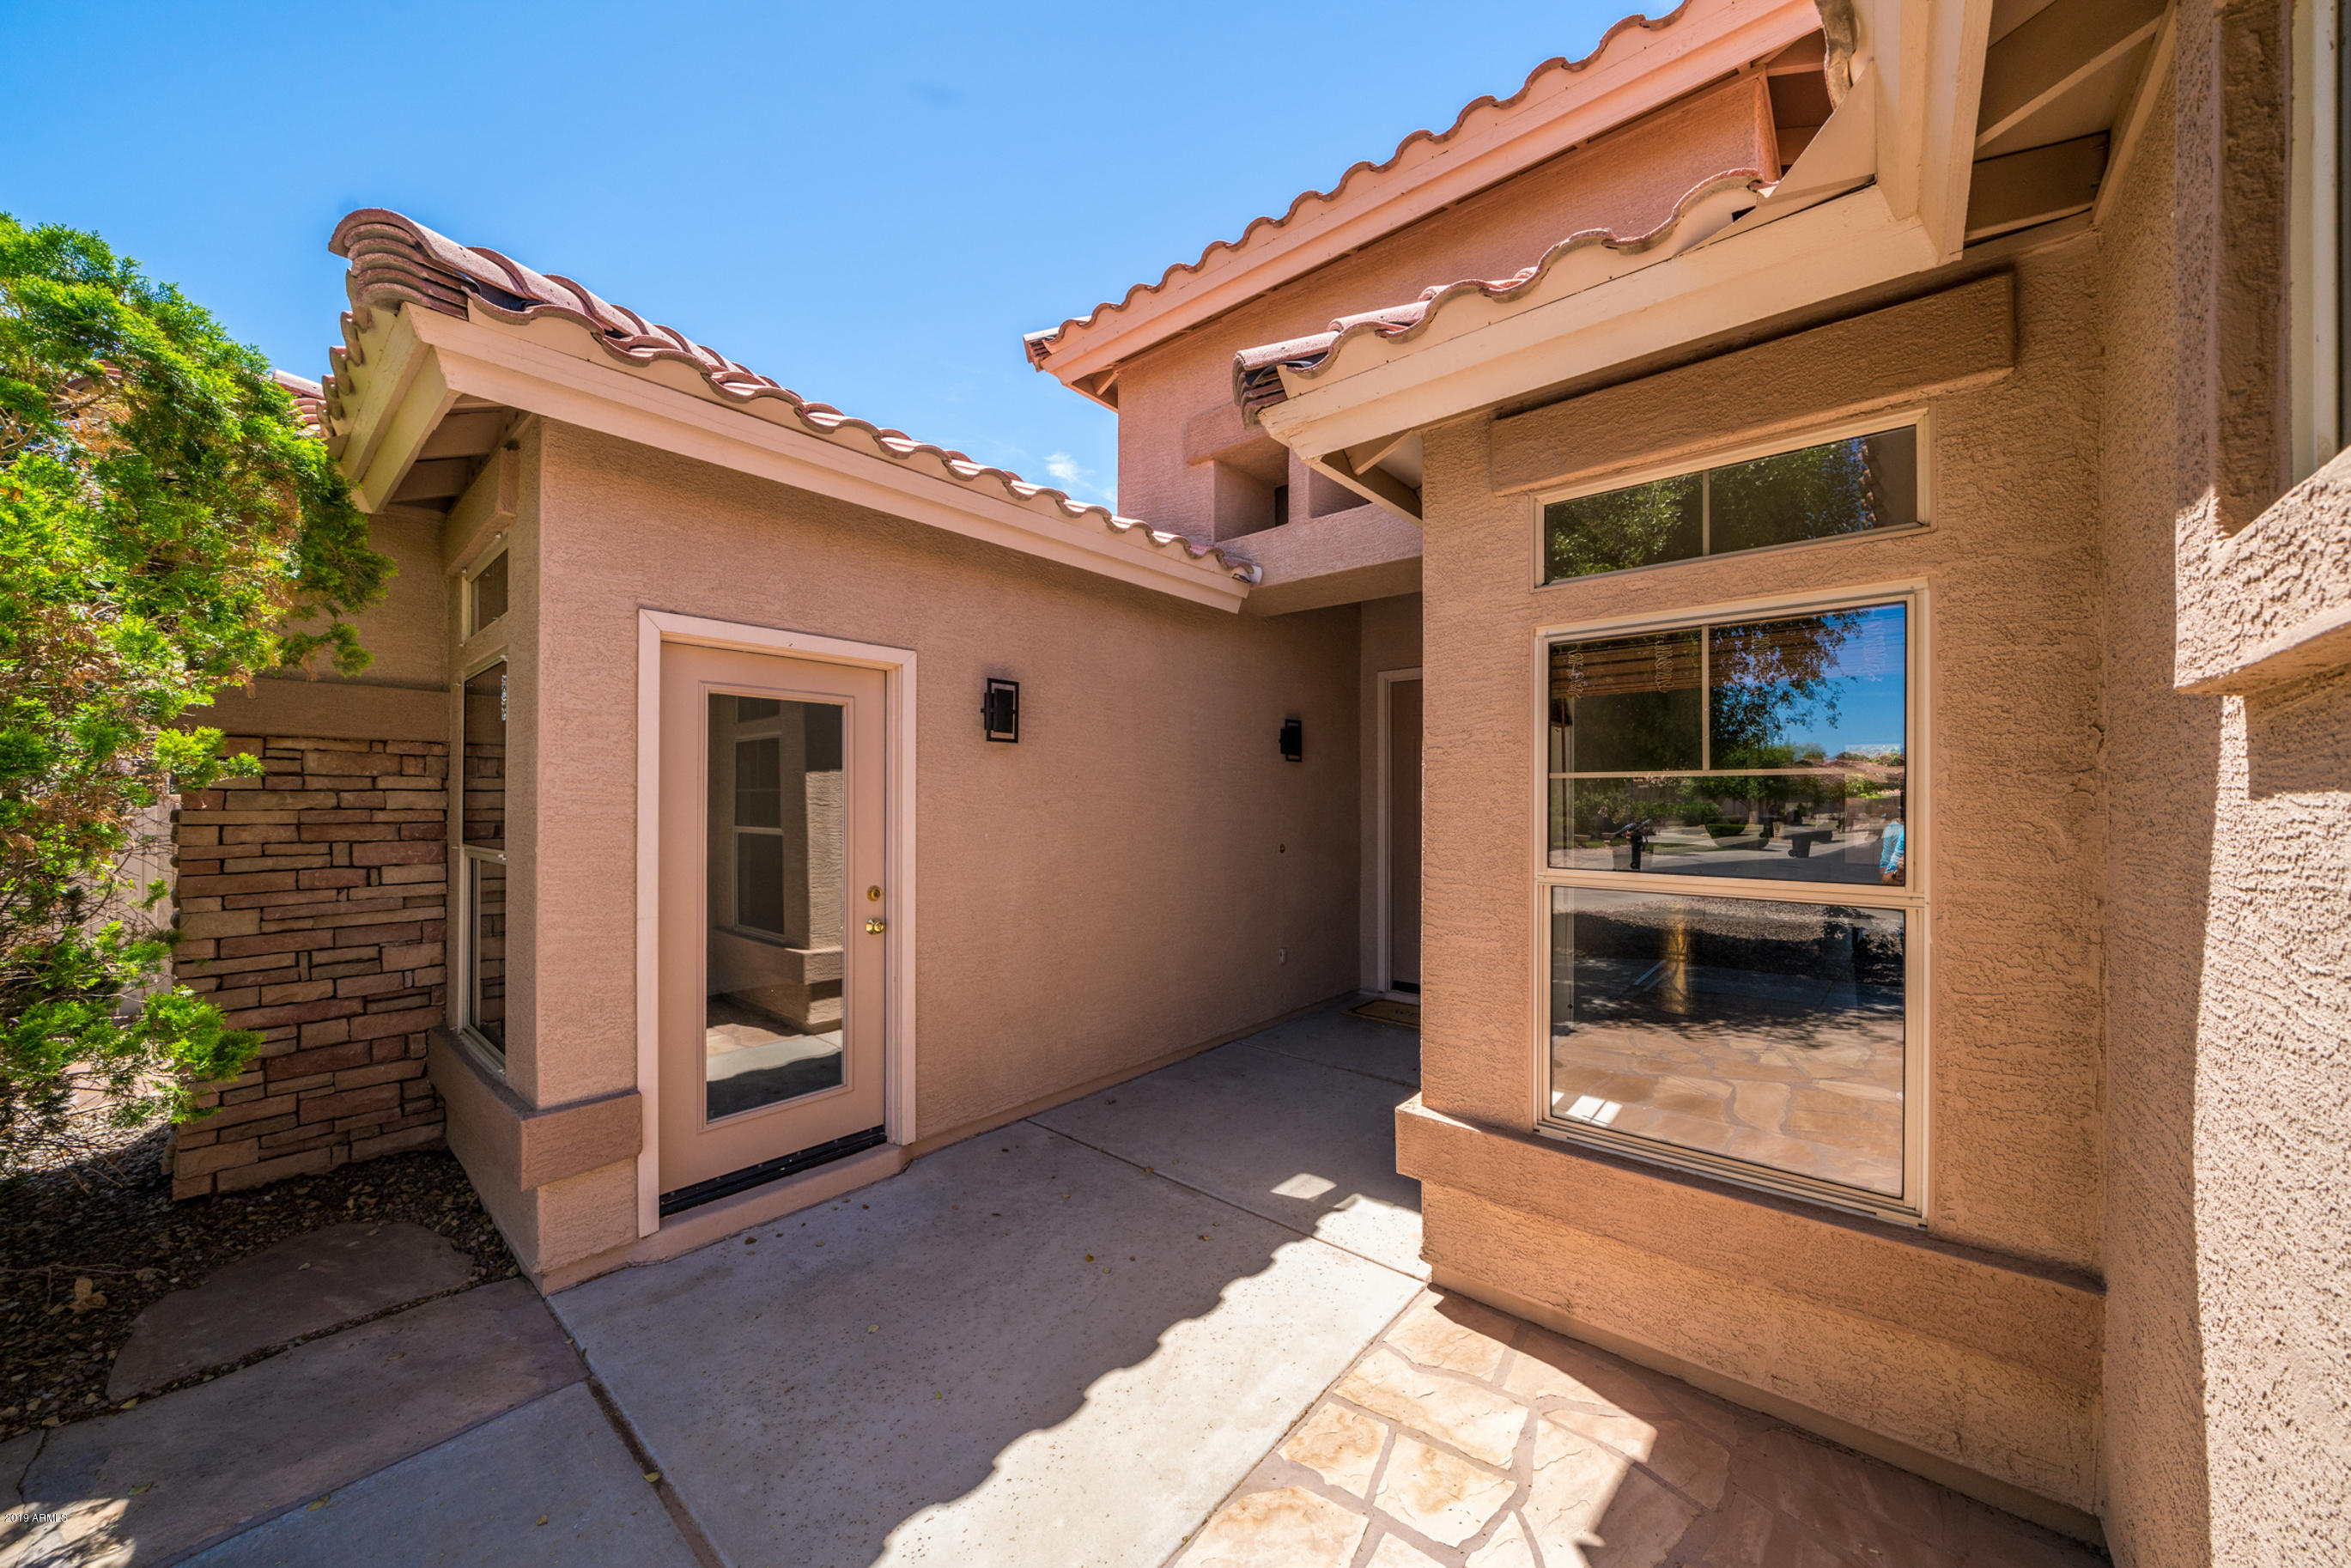 MLS 5915012 4980 S PEACHWOOD Drive, Gilbert, AZ 85298 Gilbert AZ Trilogy At Power Ranch